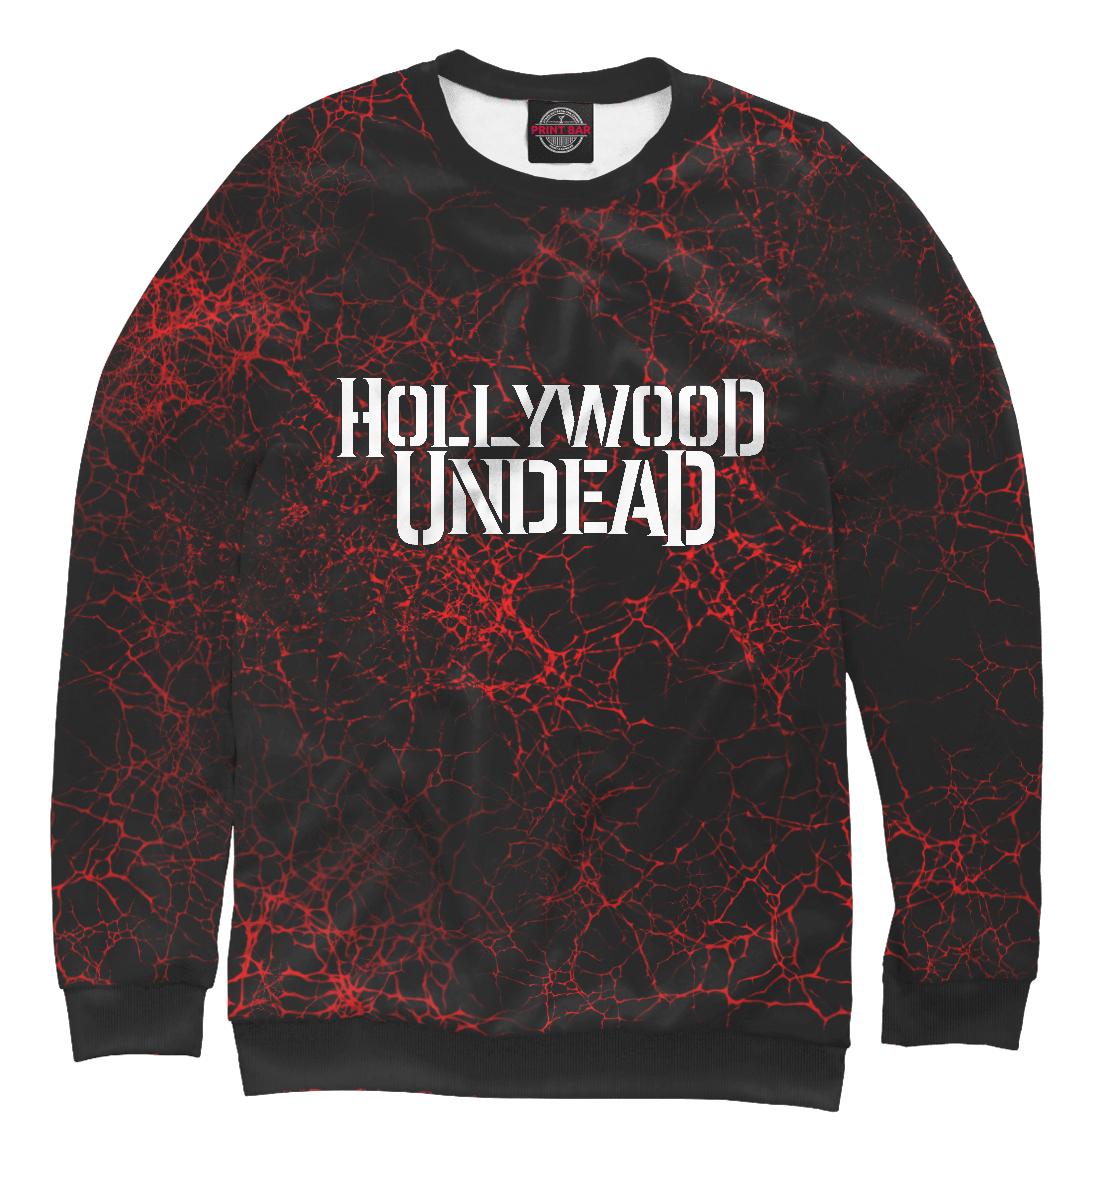 Купить Hollywood Undead, Printbar, Свитшоты, HLW-292404-swi-2